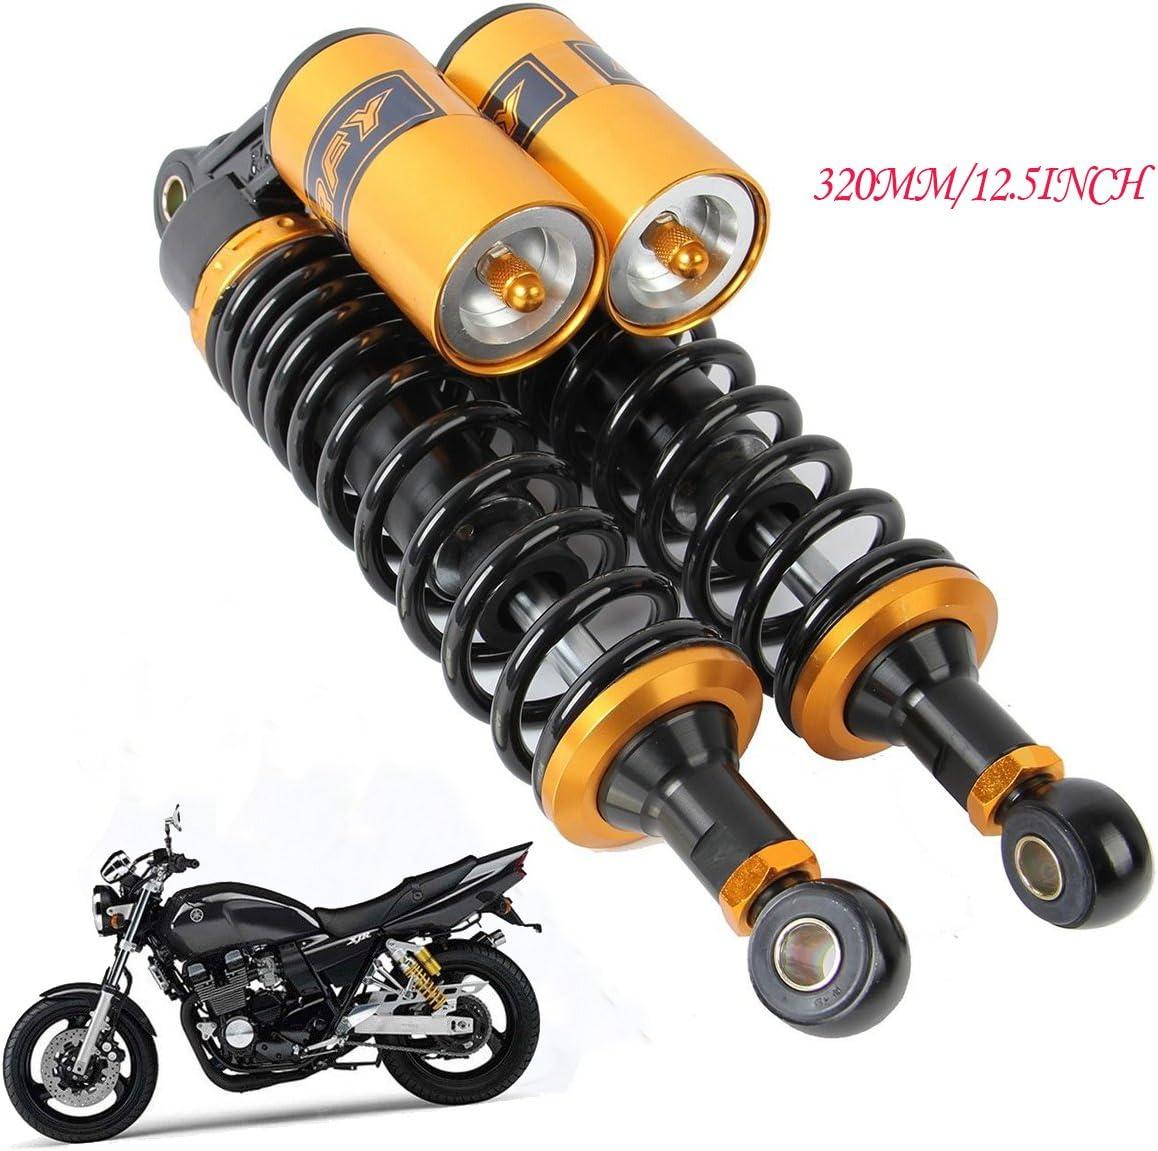 Premium Universal Motorcycle Shock Absorber Rear Suspension Air 320mm 330mm 12.6 Black Pair